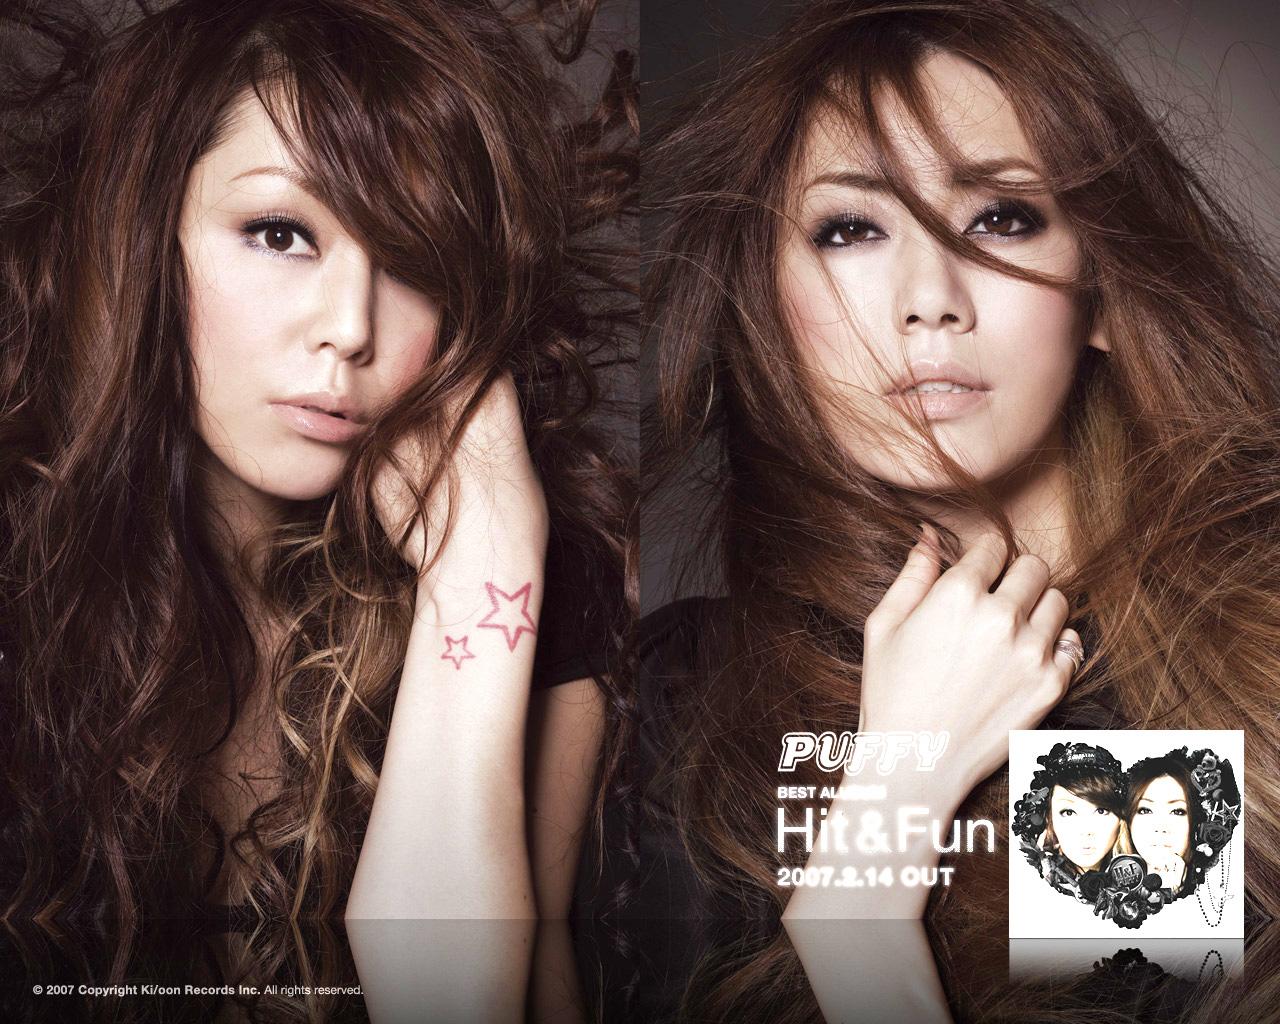 PUFFY(パフィー) 吉村由美大貫亜美 セクシー 顔アップ 唇 メイク エロかわいい画像